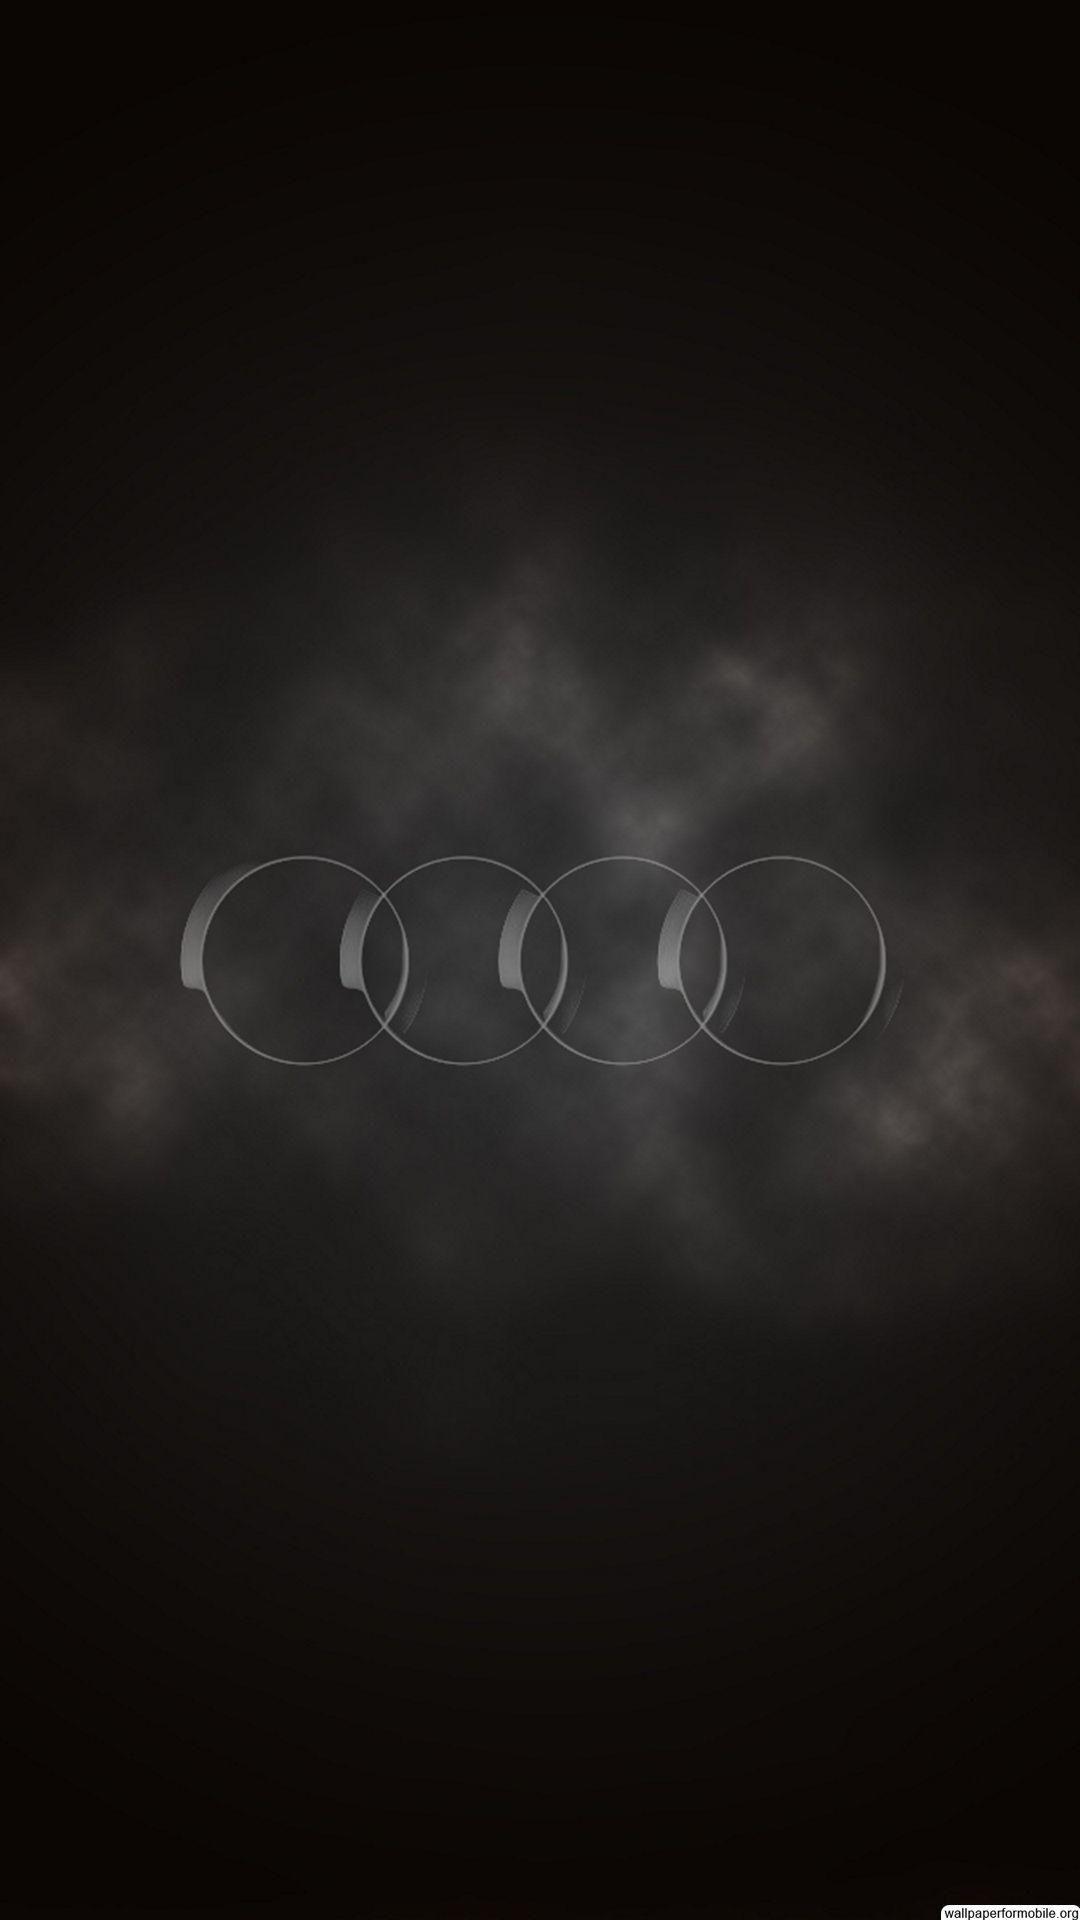 audi logo wallpapers wallpaper cave | Cars | Logo wallpaper hd, Logos, Wallpaper